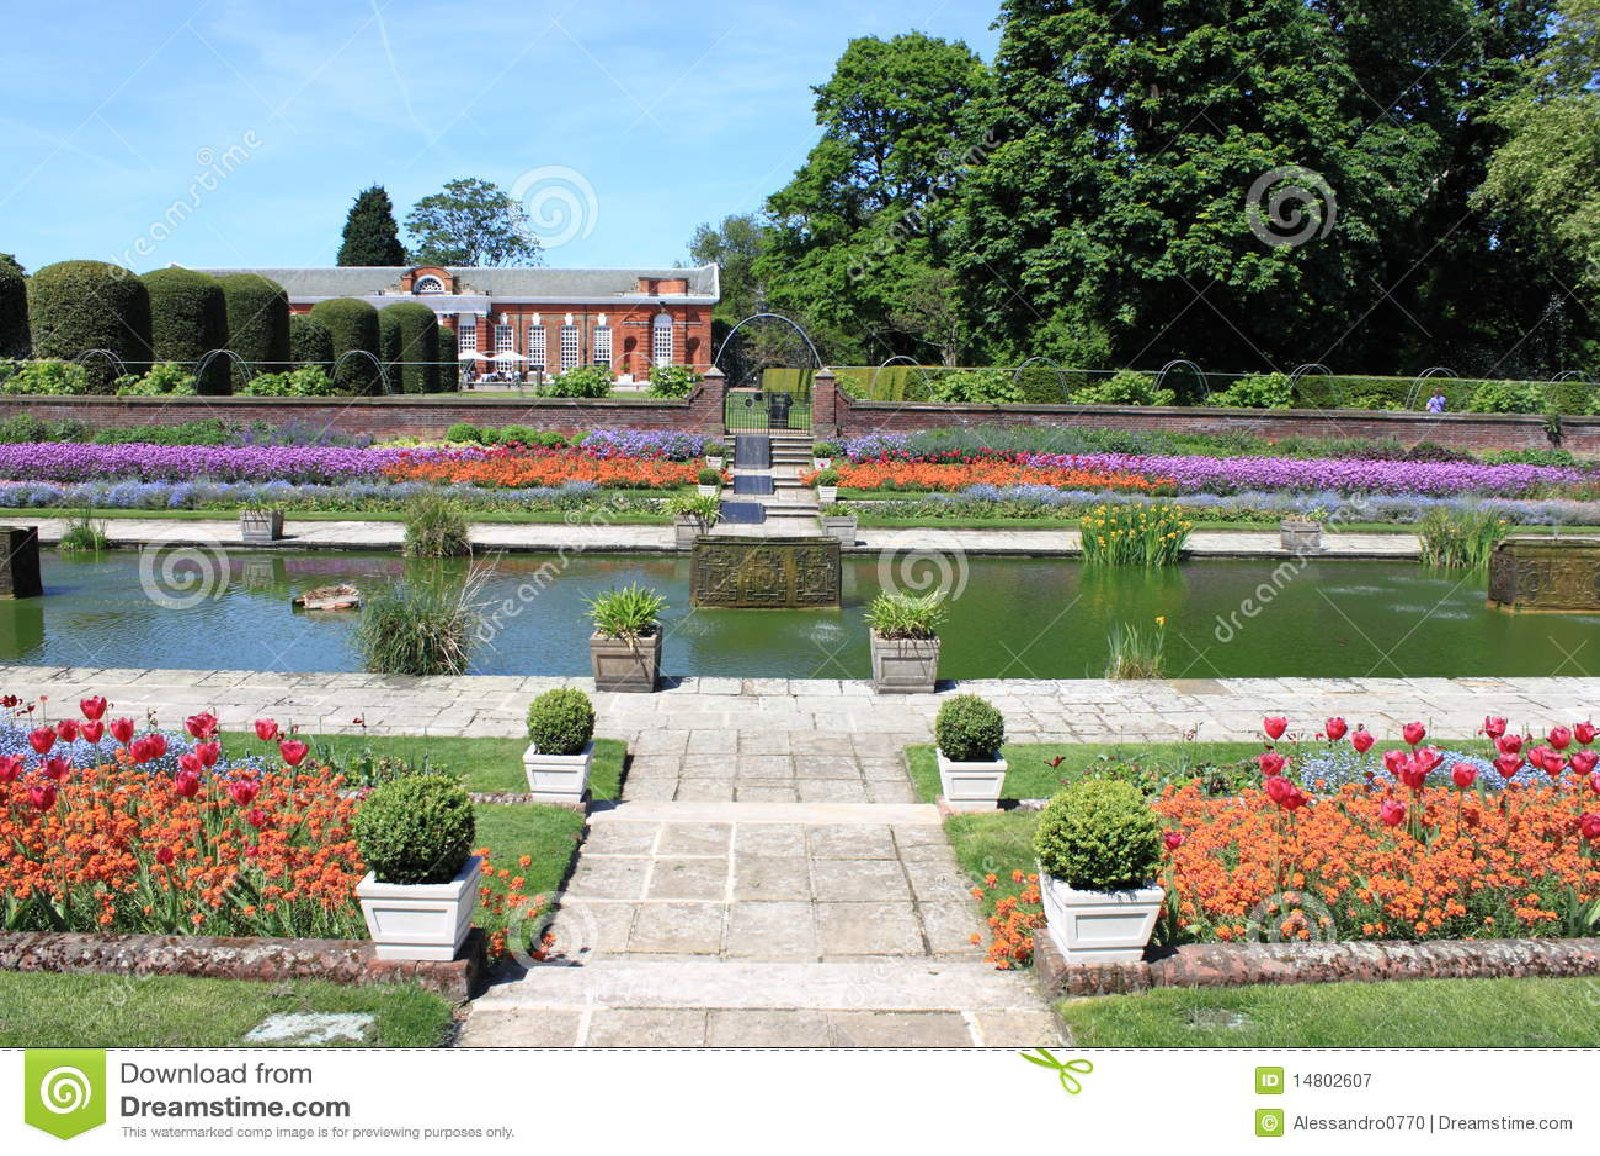 Jardines del palacio de kensington fotograf a de archivo for Jardines de kensington